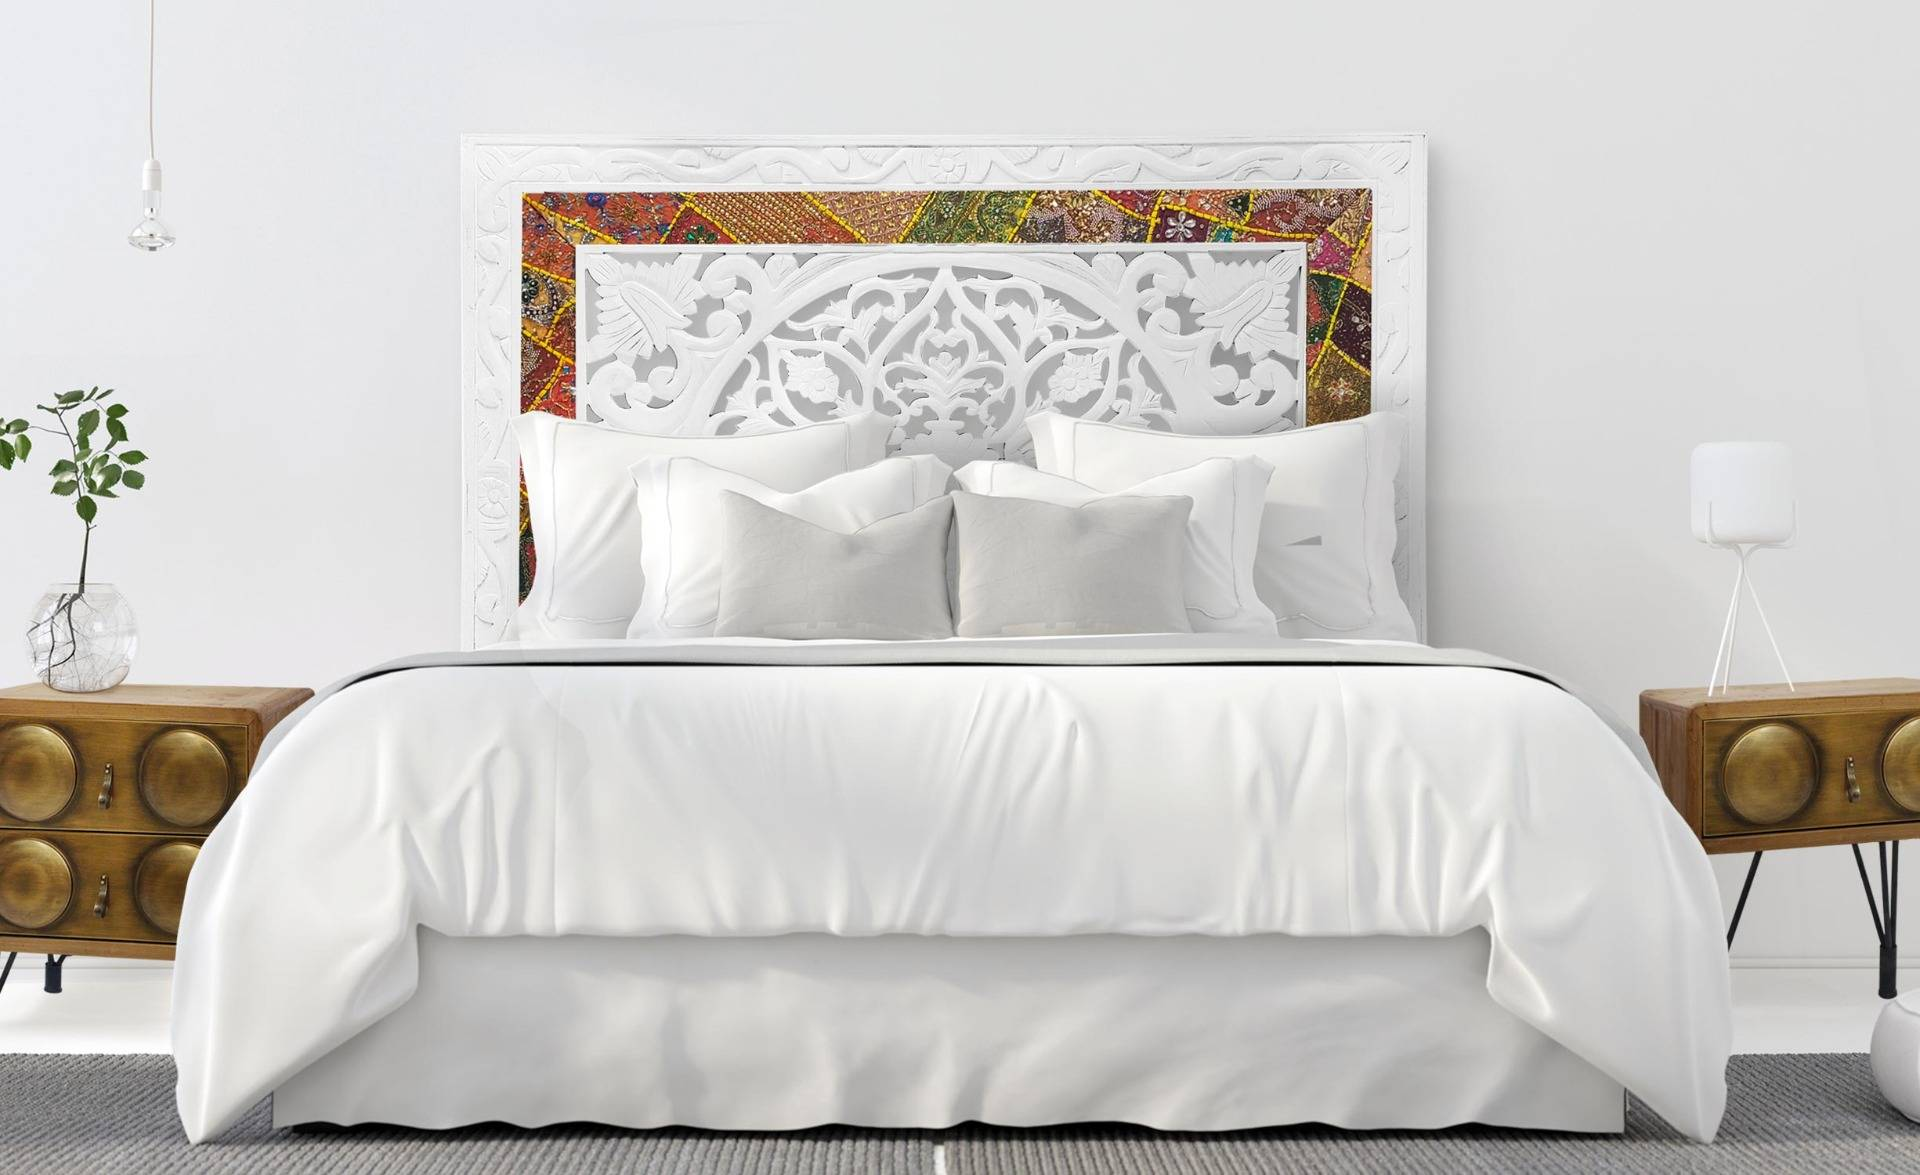 MENZZO Tête de lit Koutoubia Indienne 160cm Blanc